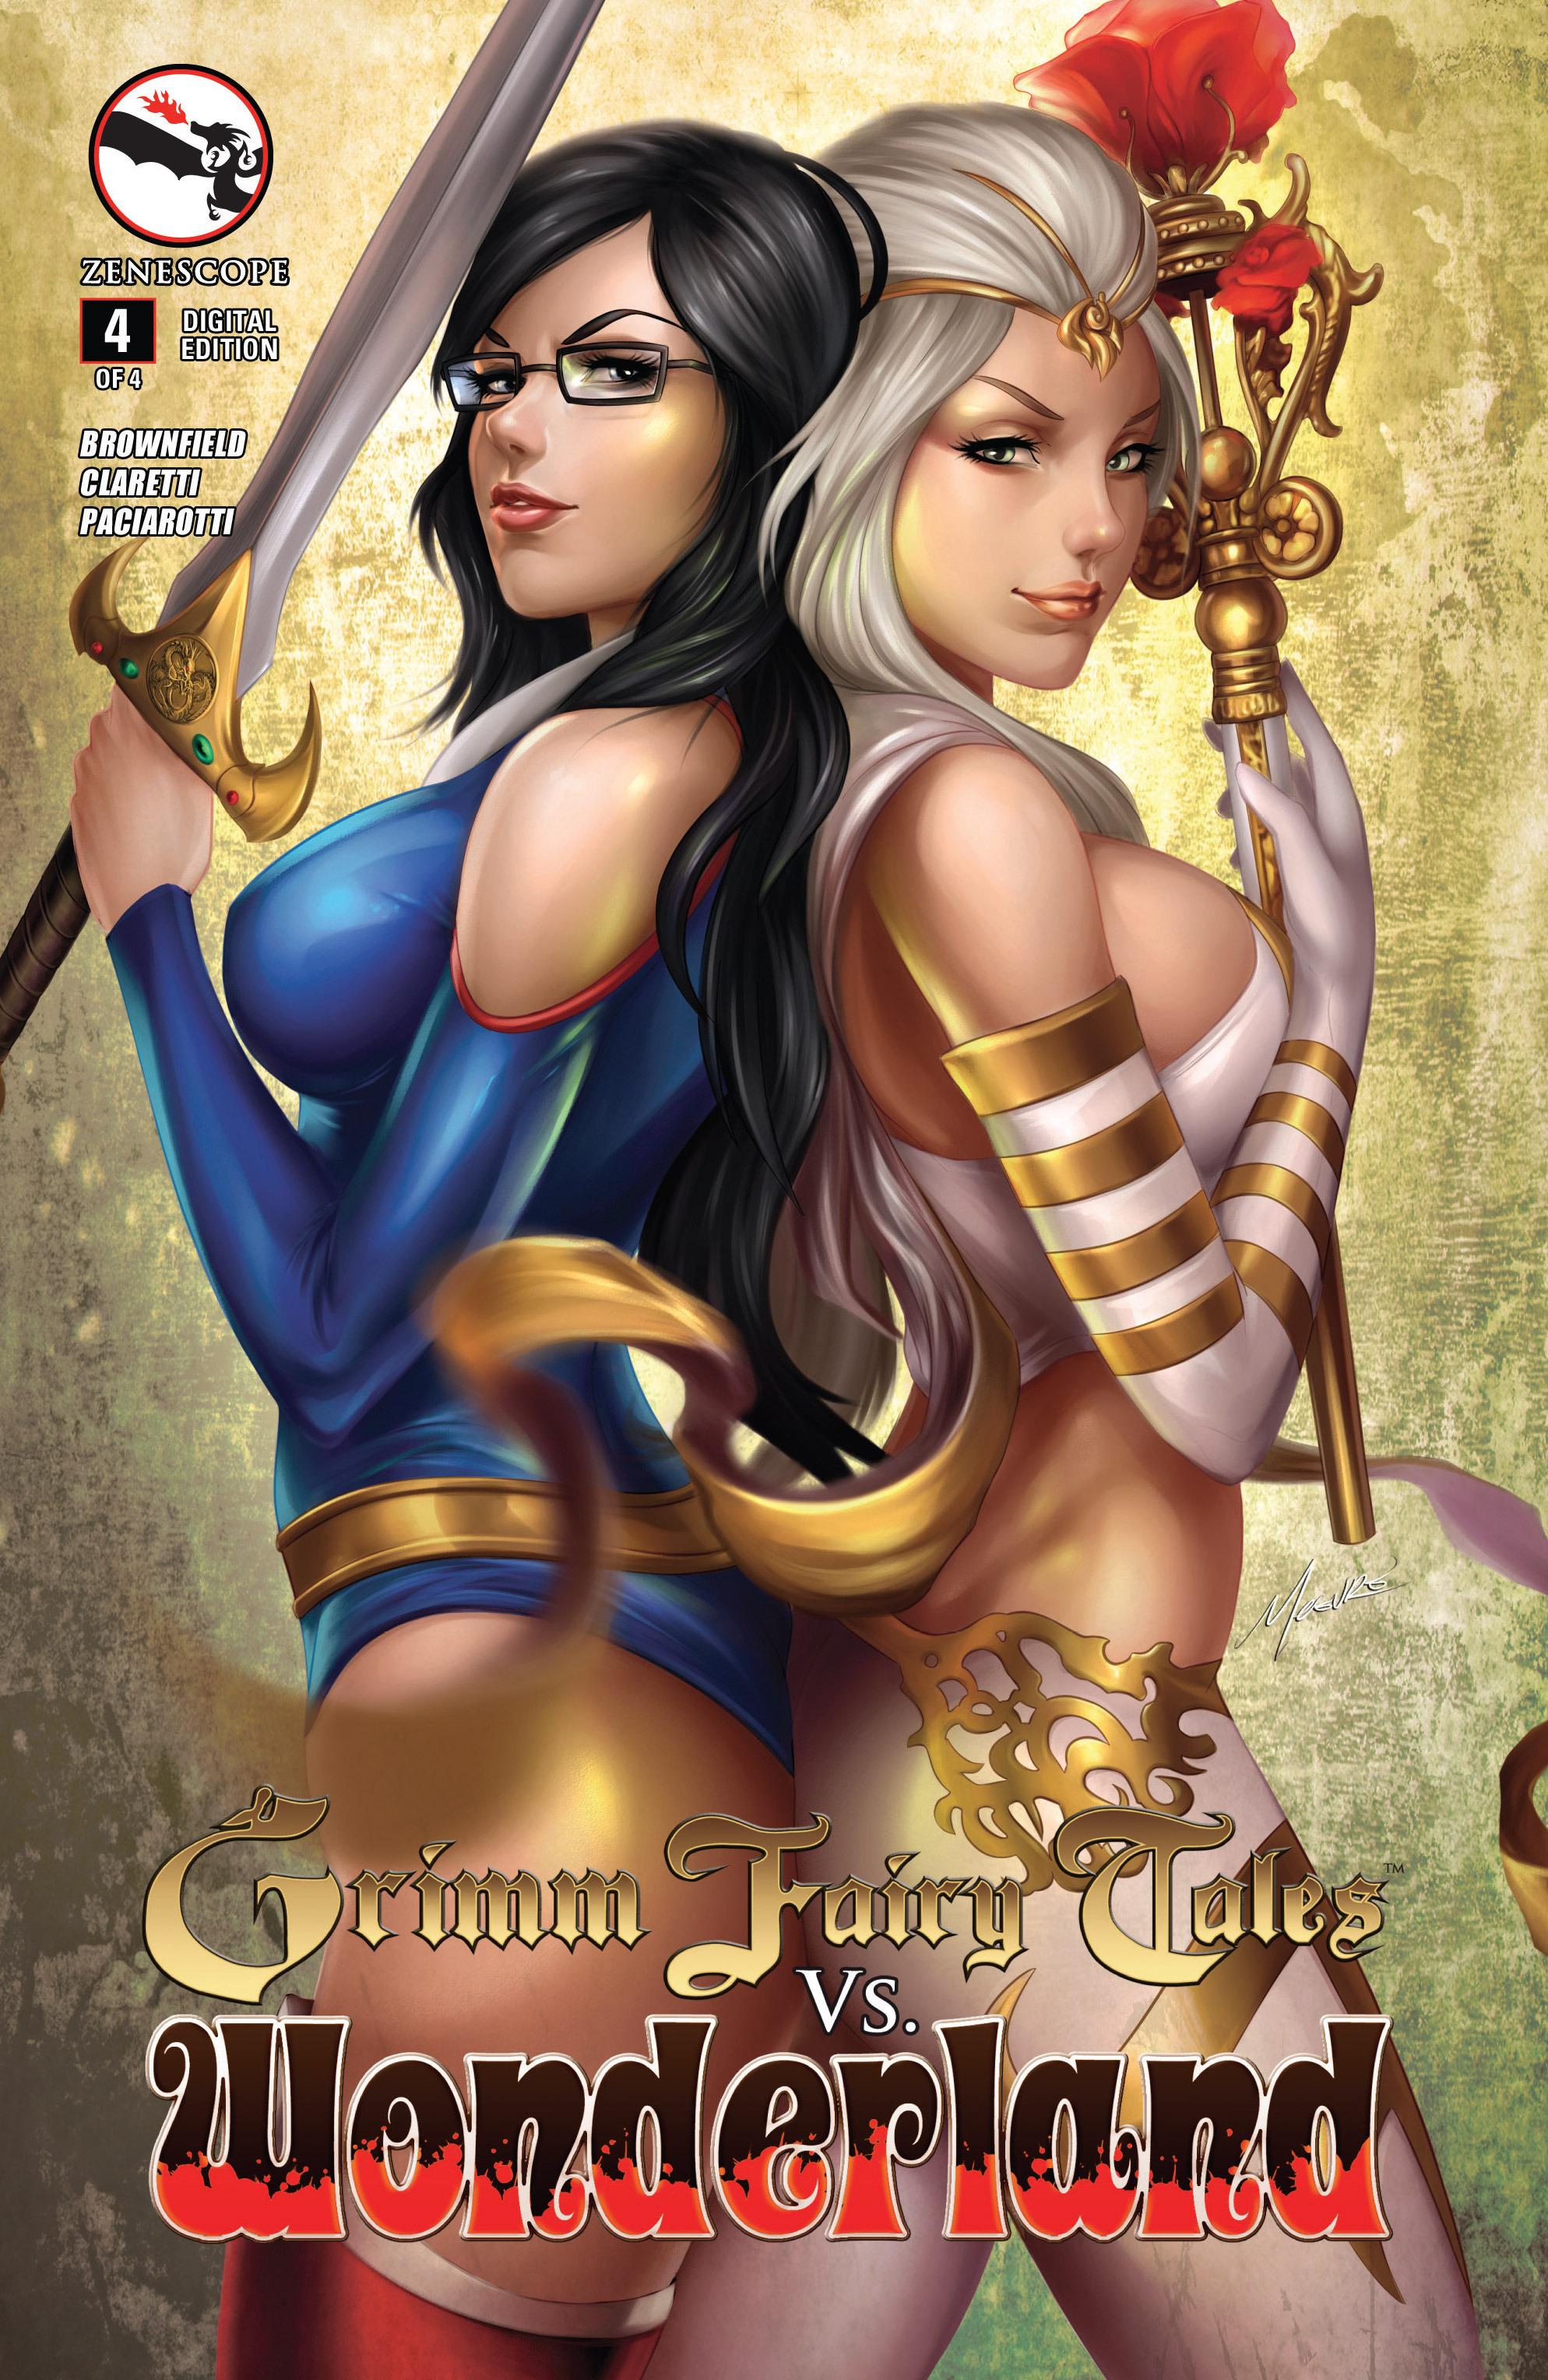 Read online Grimm Fairy Tales vs. Wonderland comic -  Issue #4 - 2